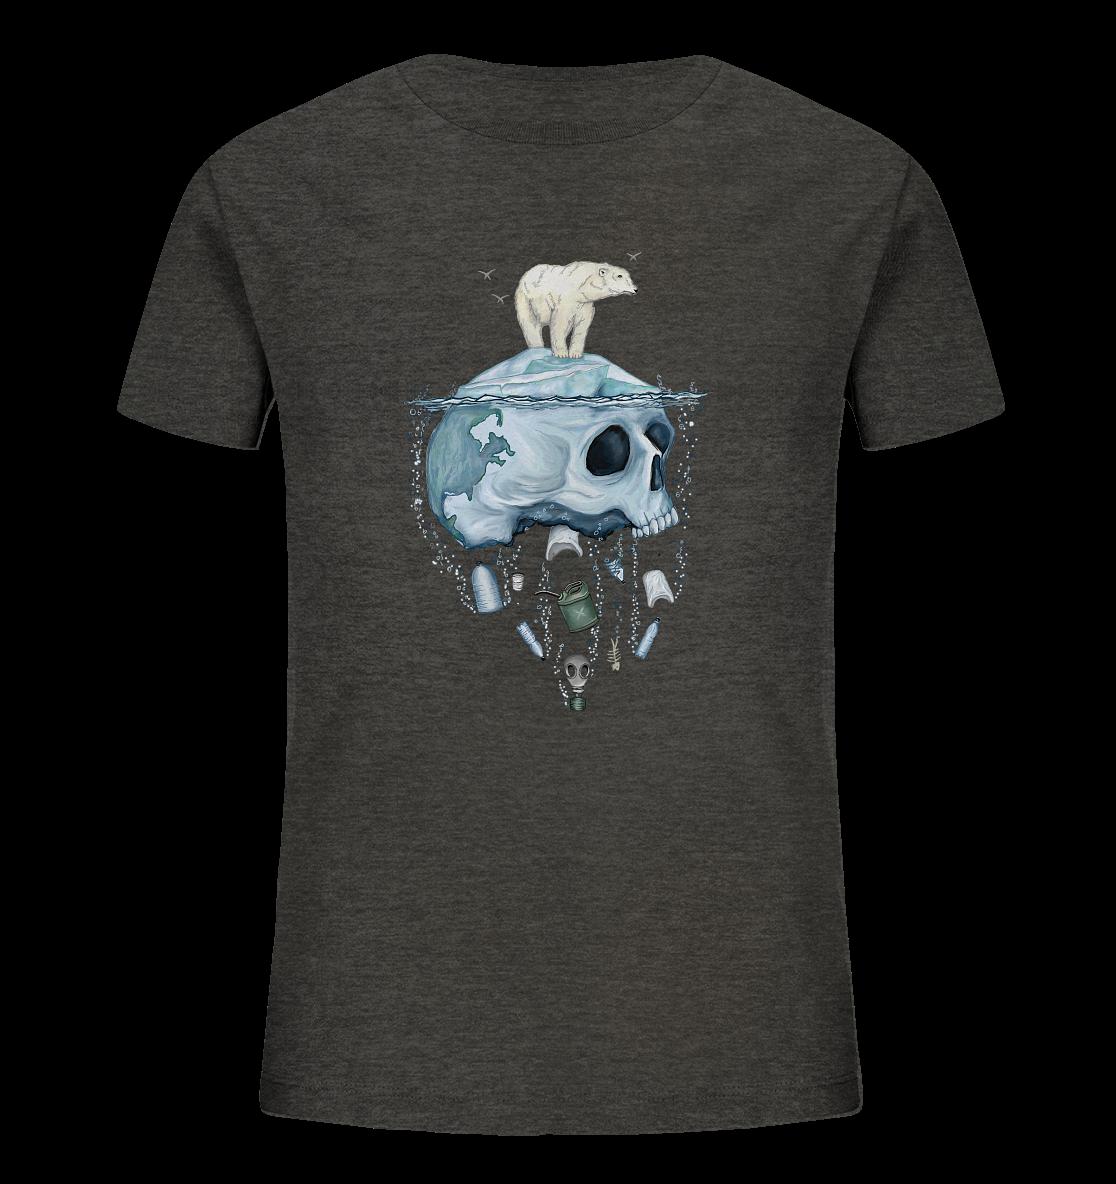 front-kids-organic-shirt-252625-1116x-1.png